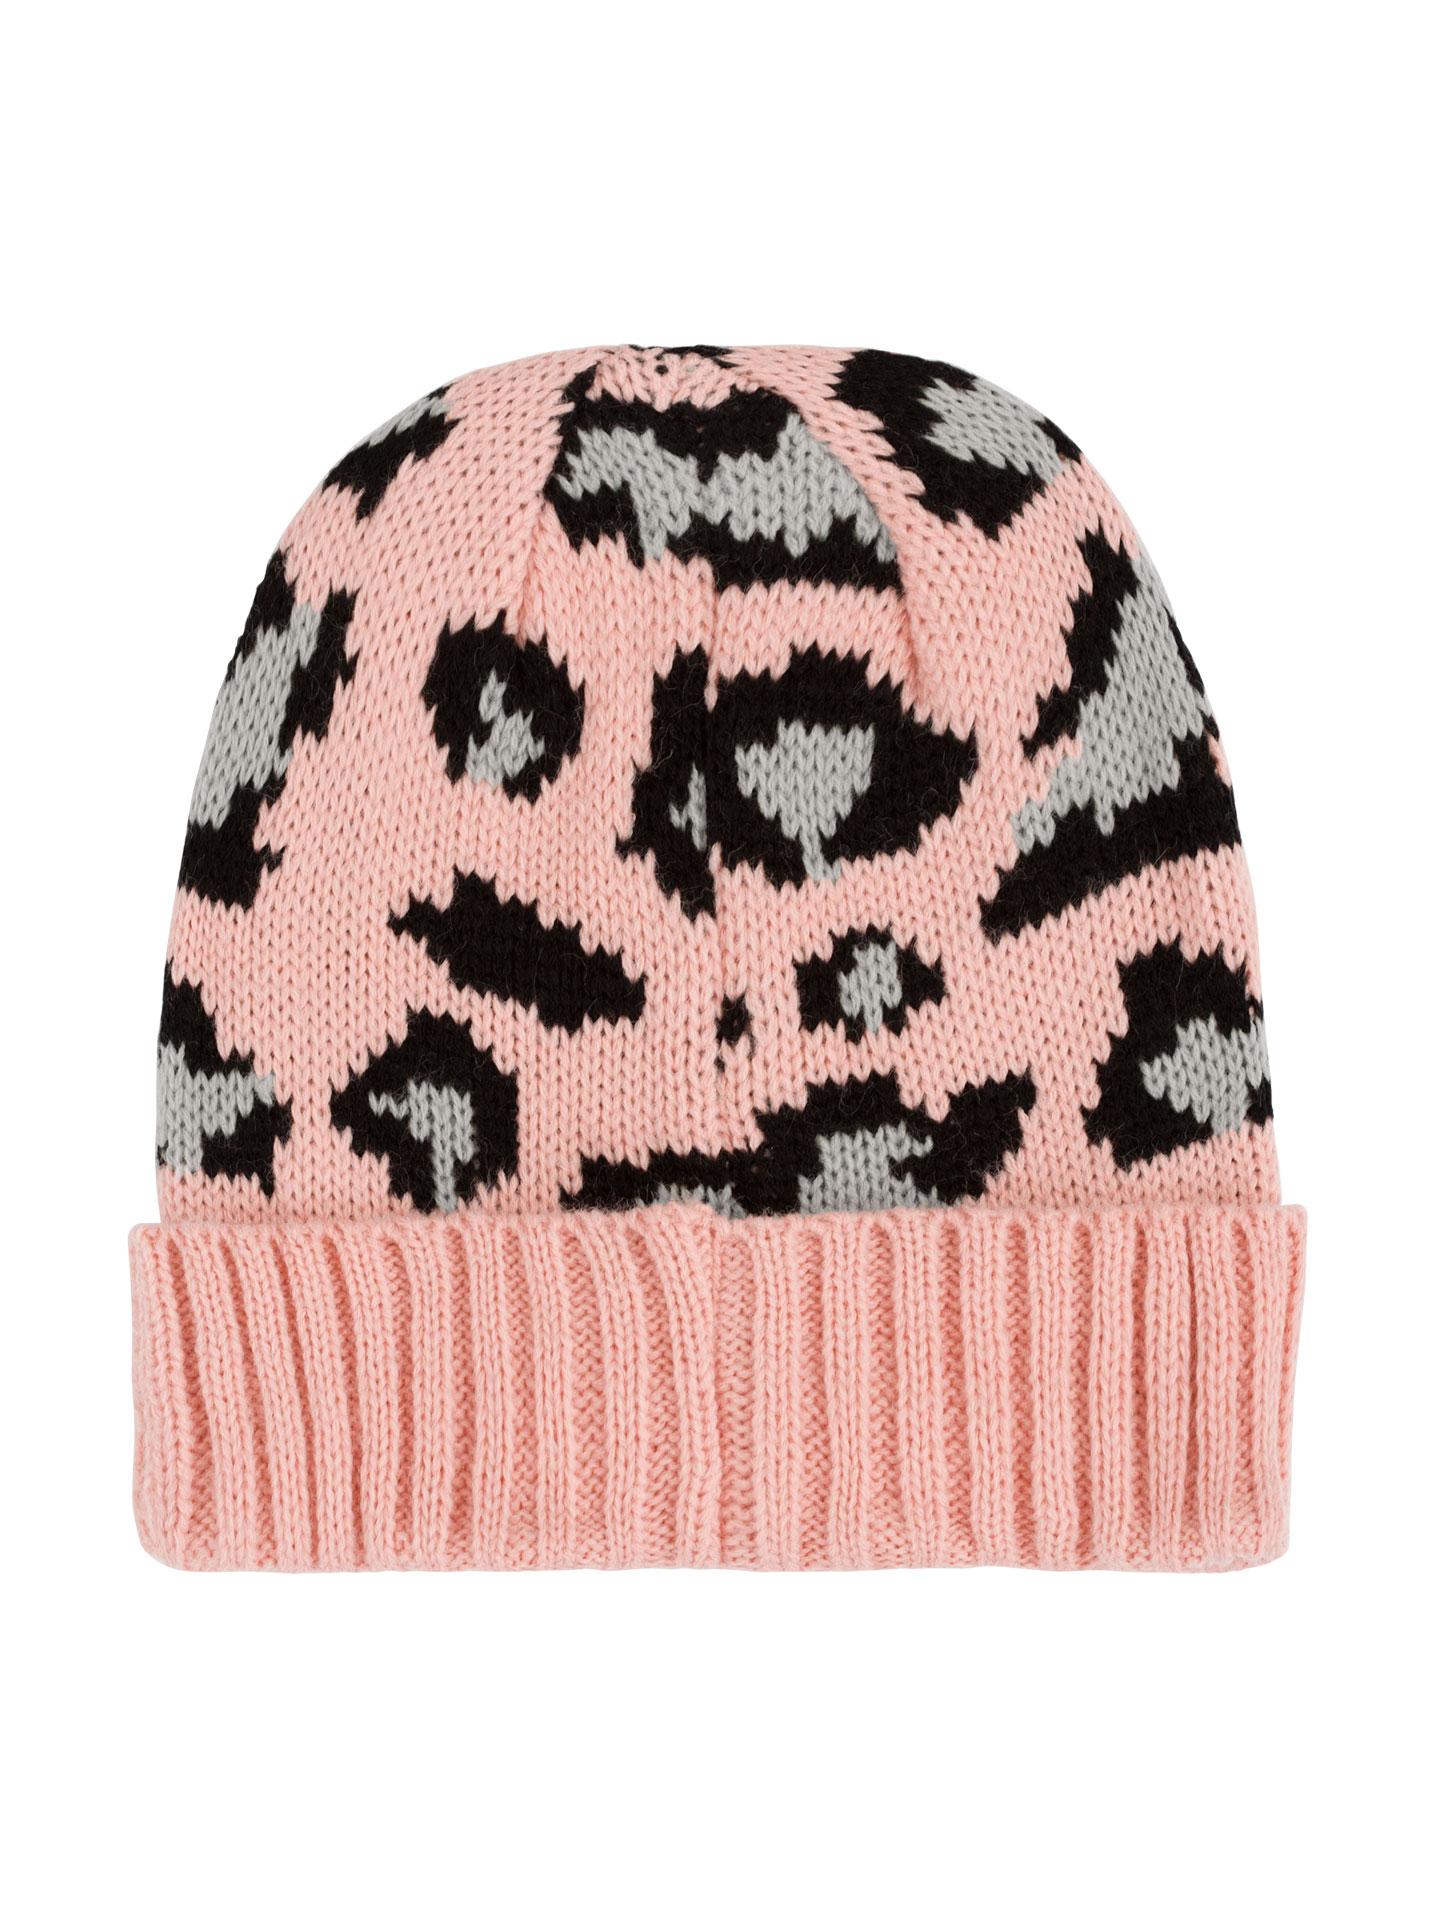 Leopard knitted beanie in pink dec2ed287ec